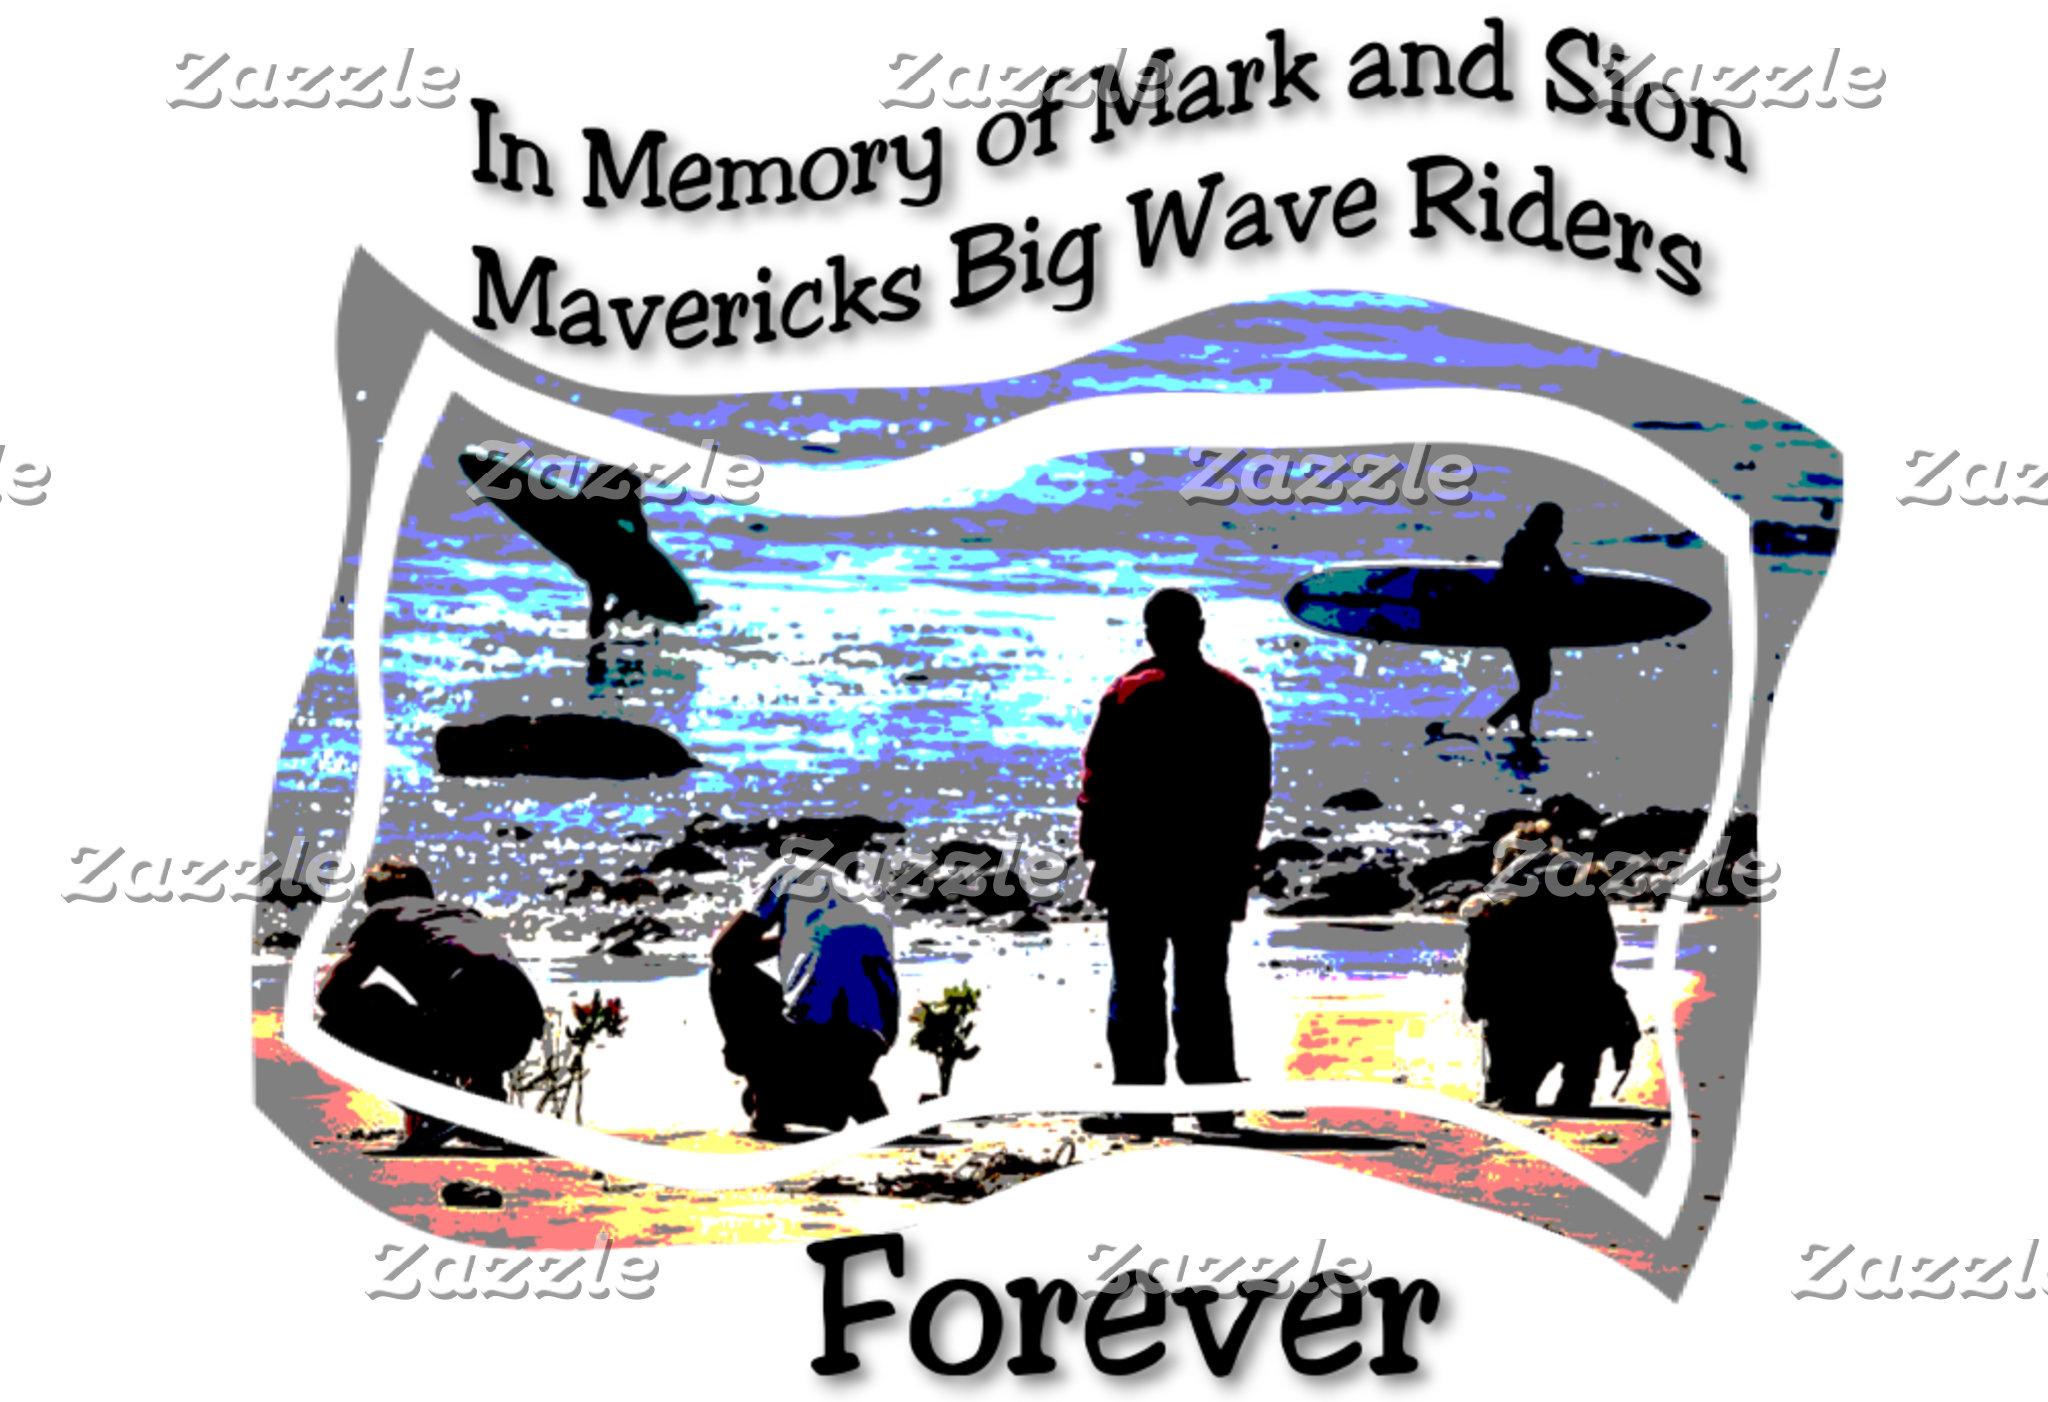 Mavericks Memorial